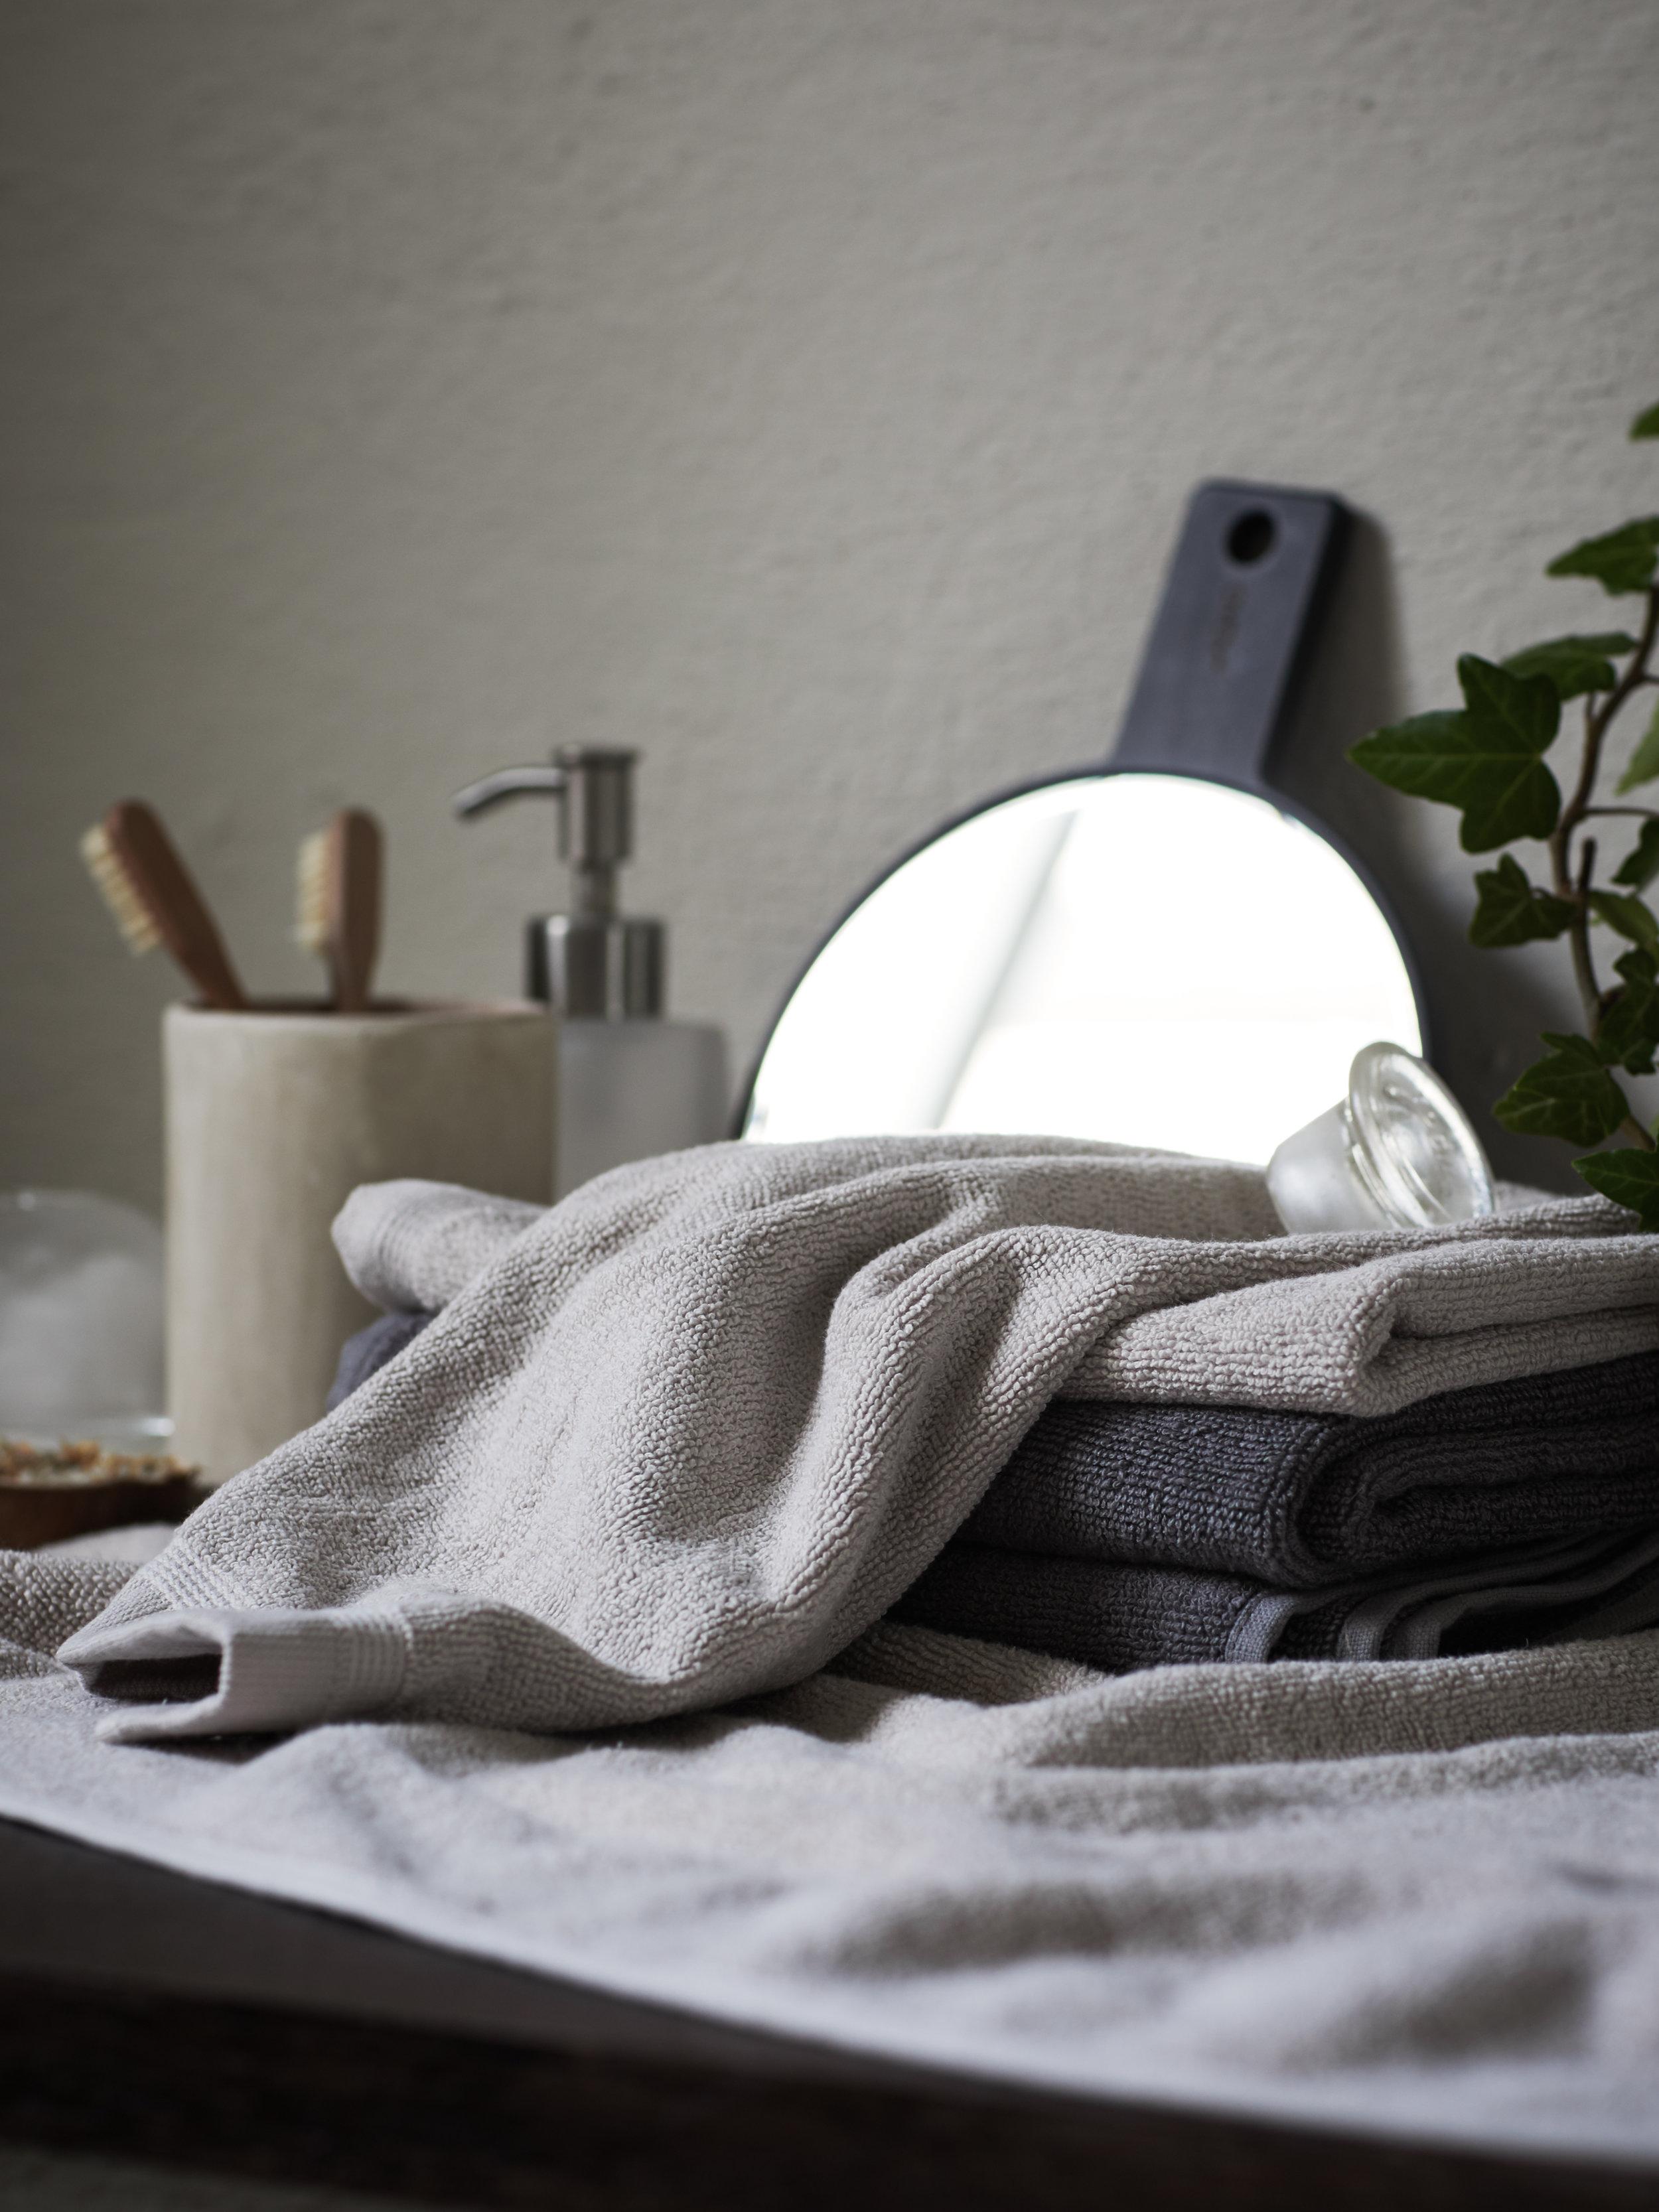 Himla_SignedbyDaniellaWitte_bath_lina-towel-motherofpearl-steel_S.jpg